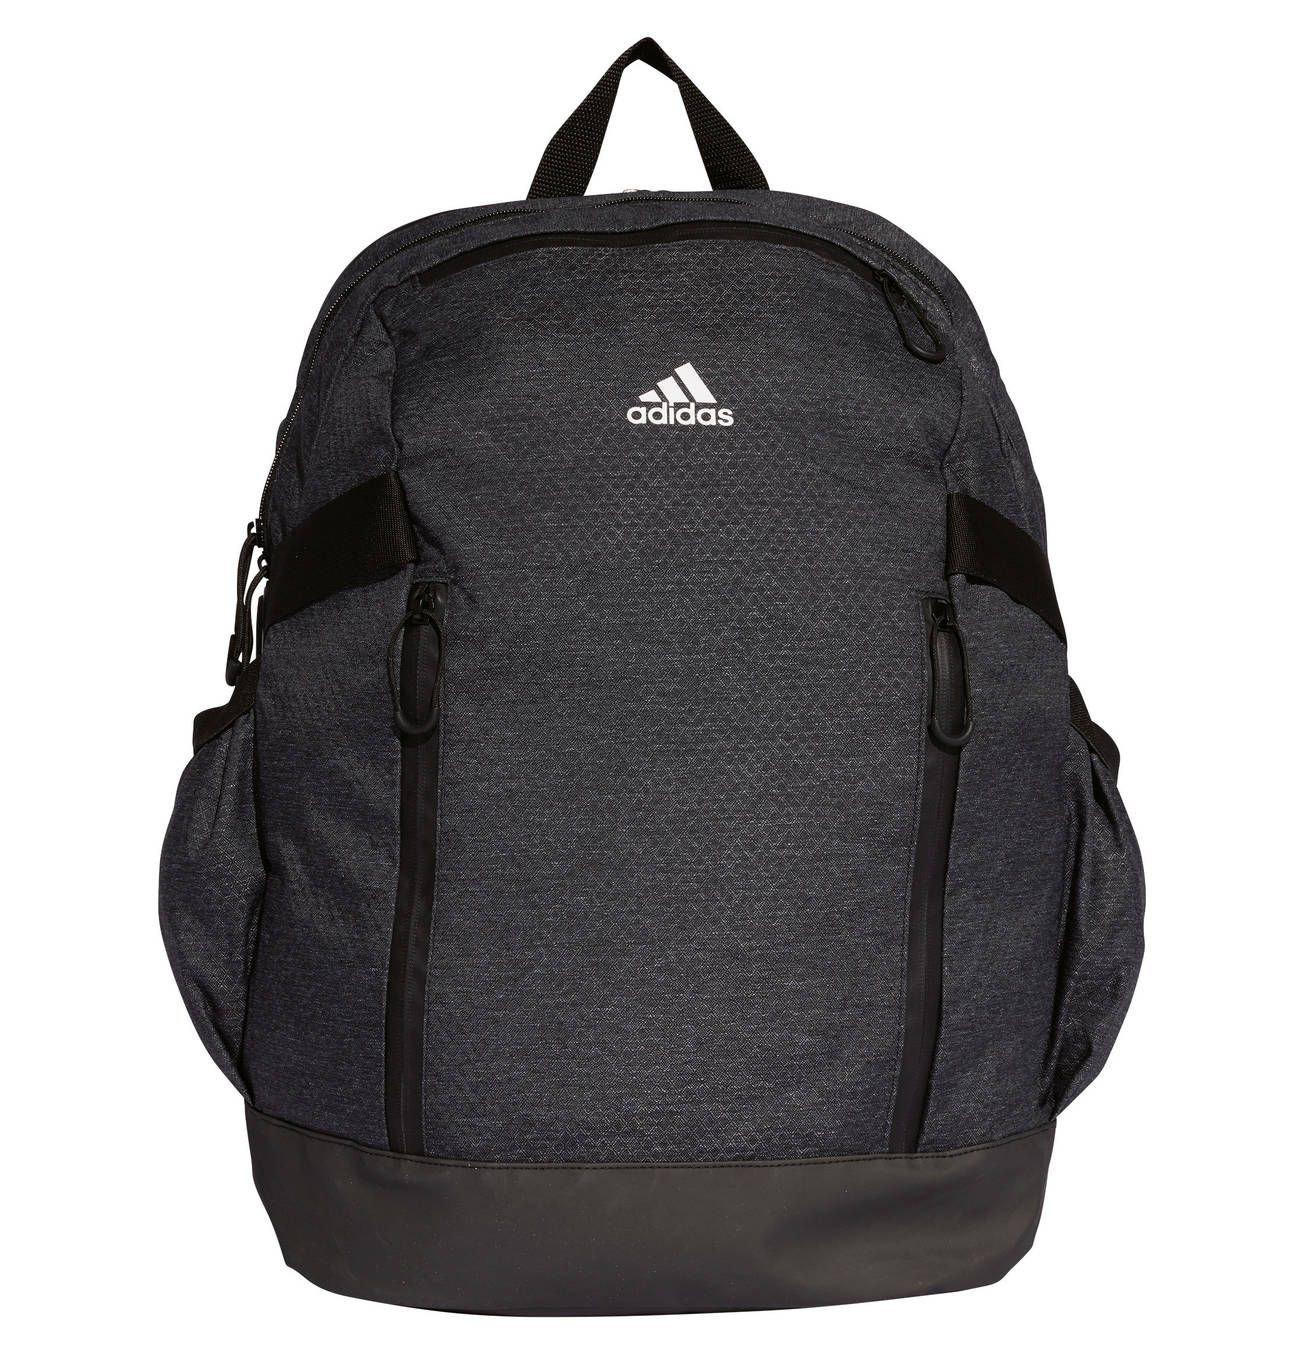 karstadt adidas rucksack